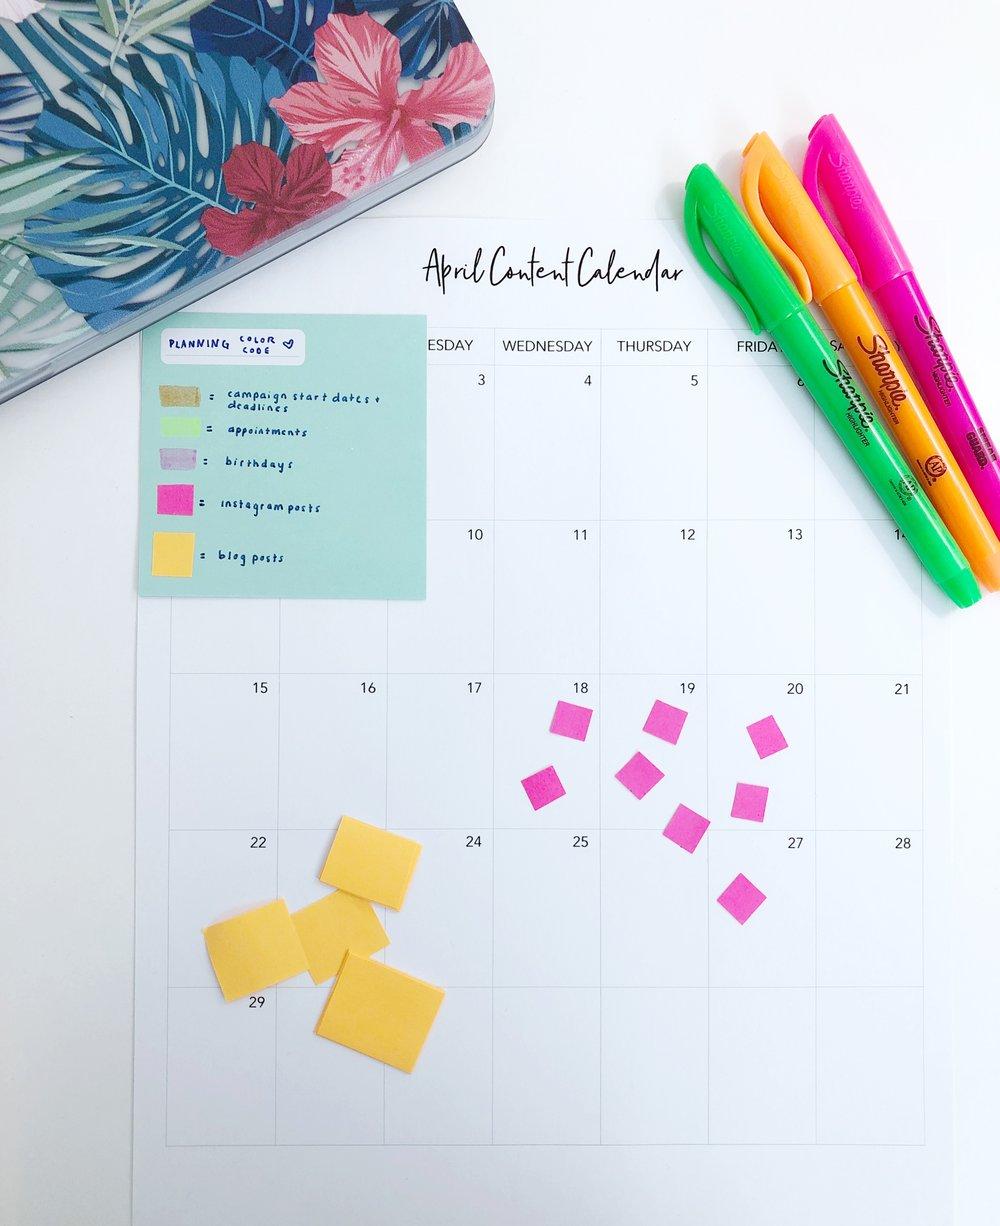 Content Calendar Corrected.jpg